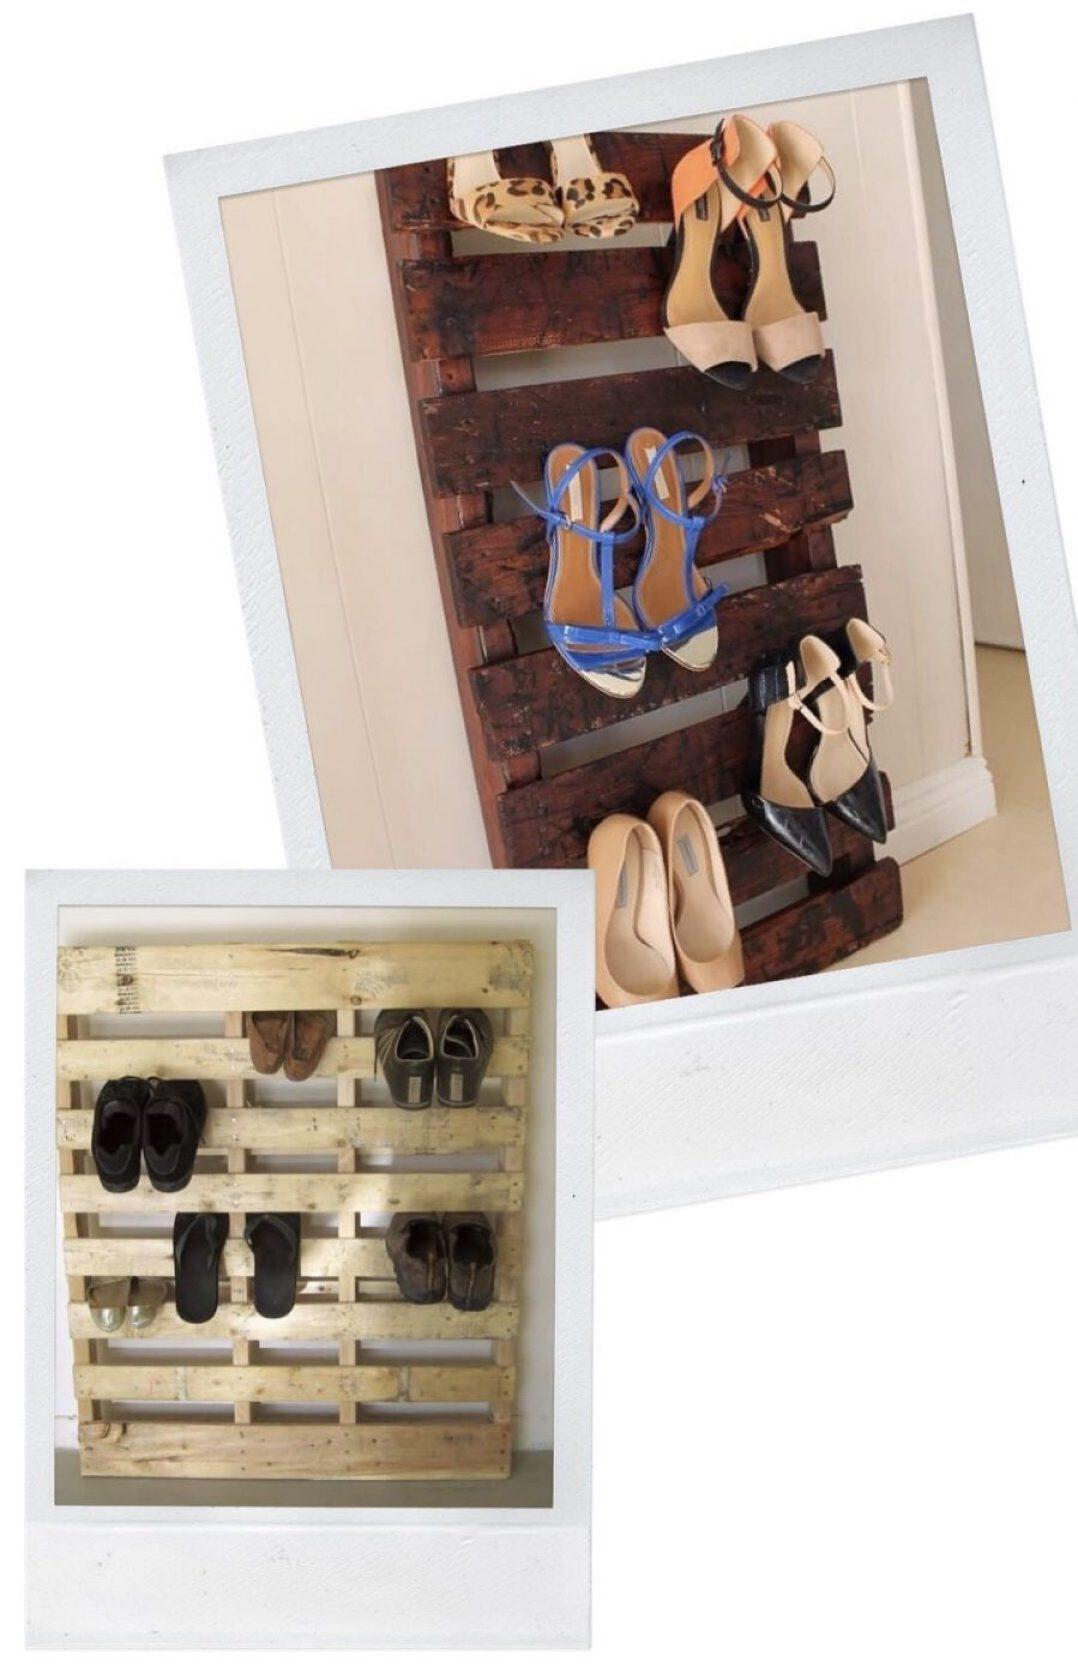 Shoe Storage - Use a pallet